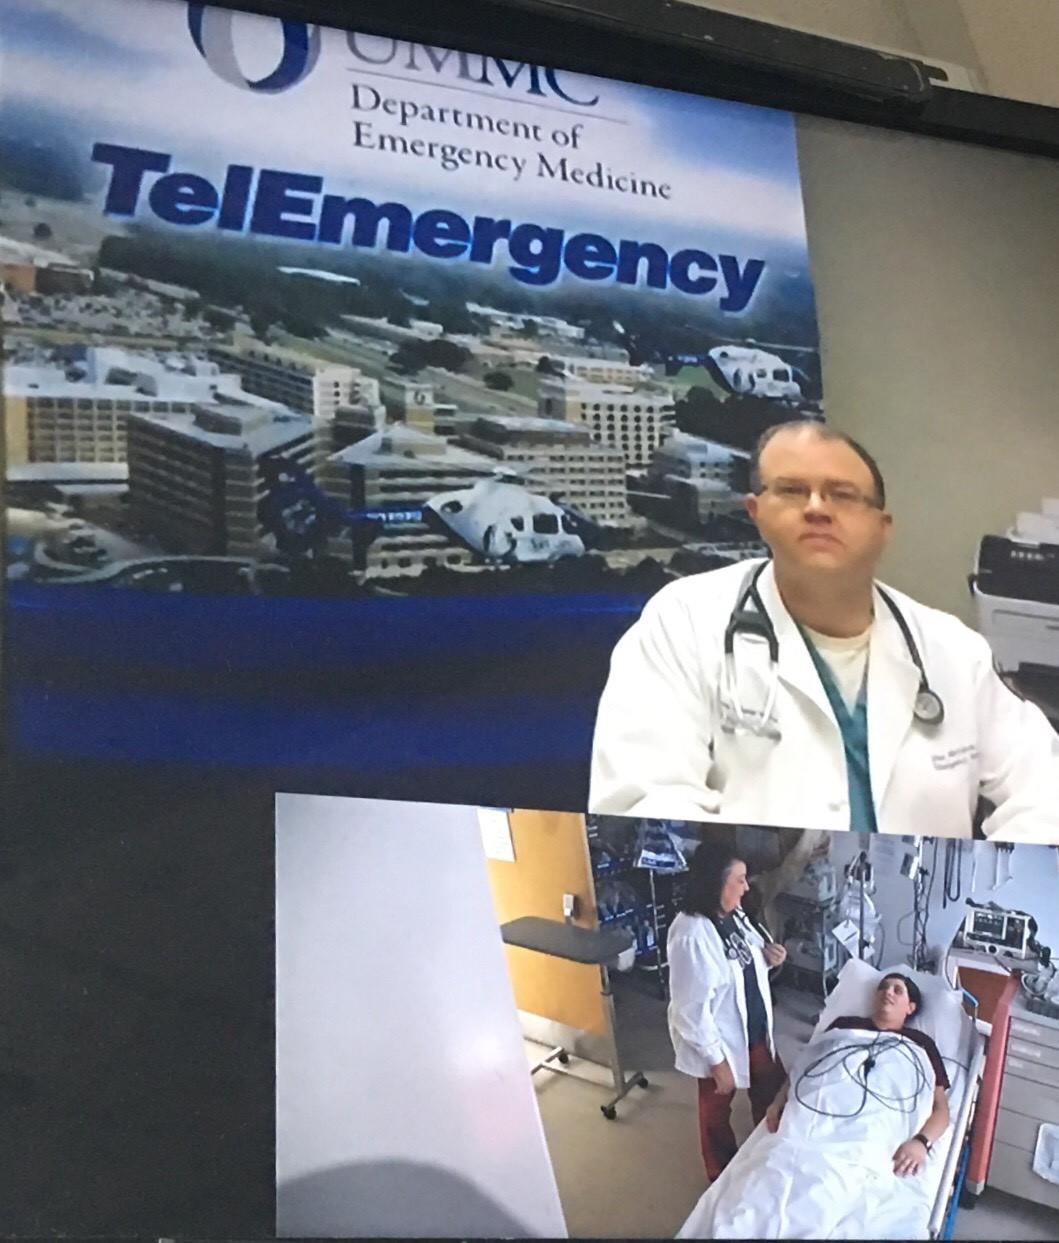 Lewis County General Hospital Emergency Room